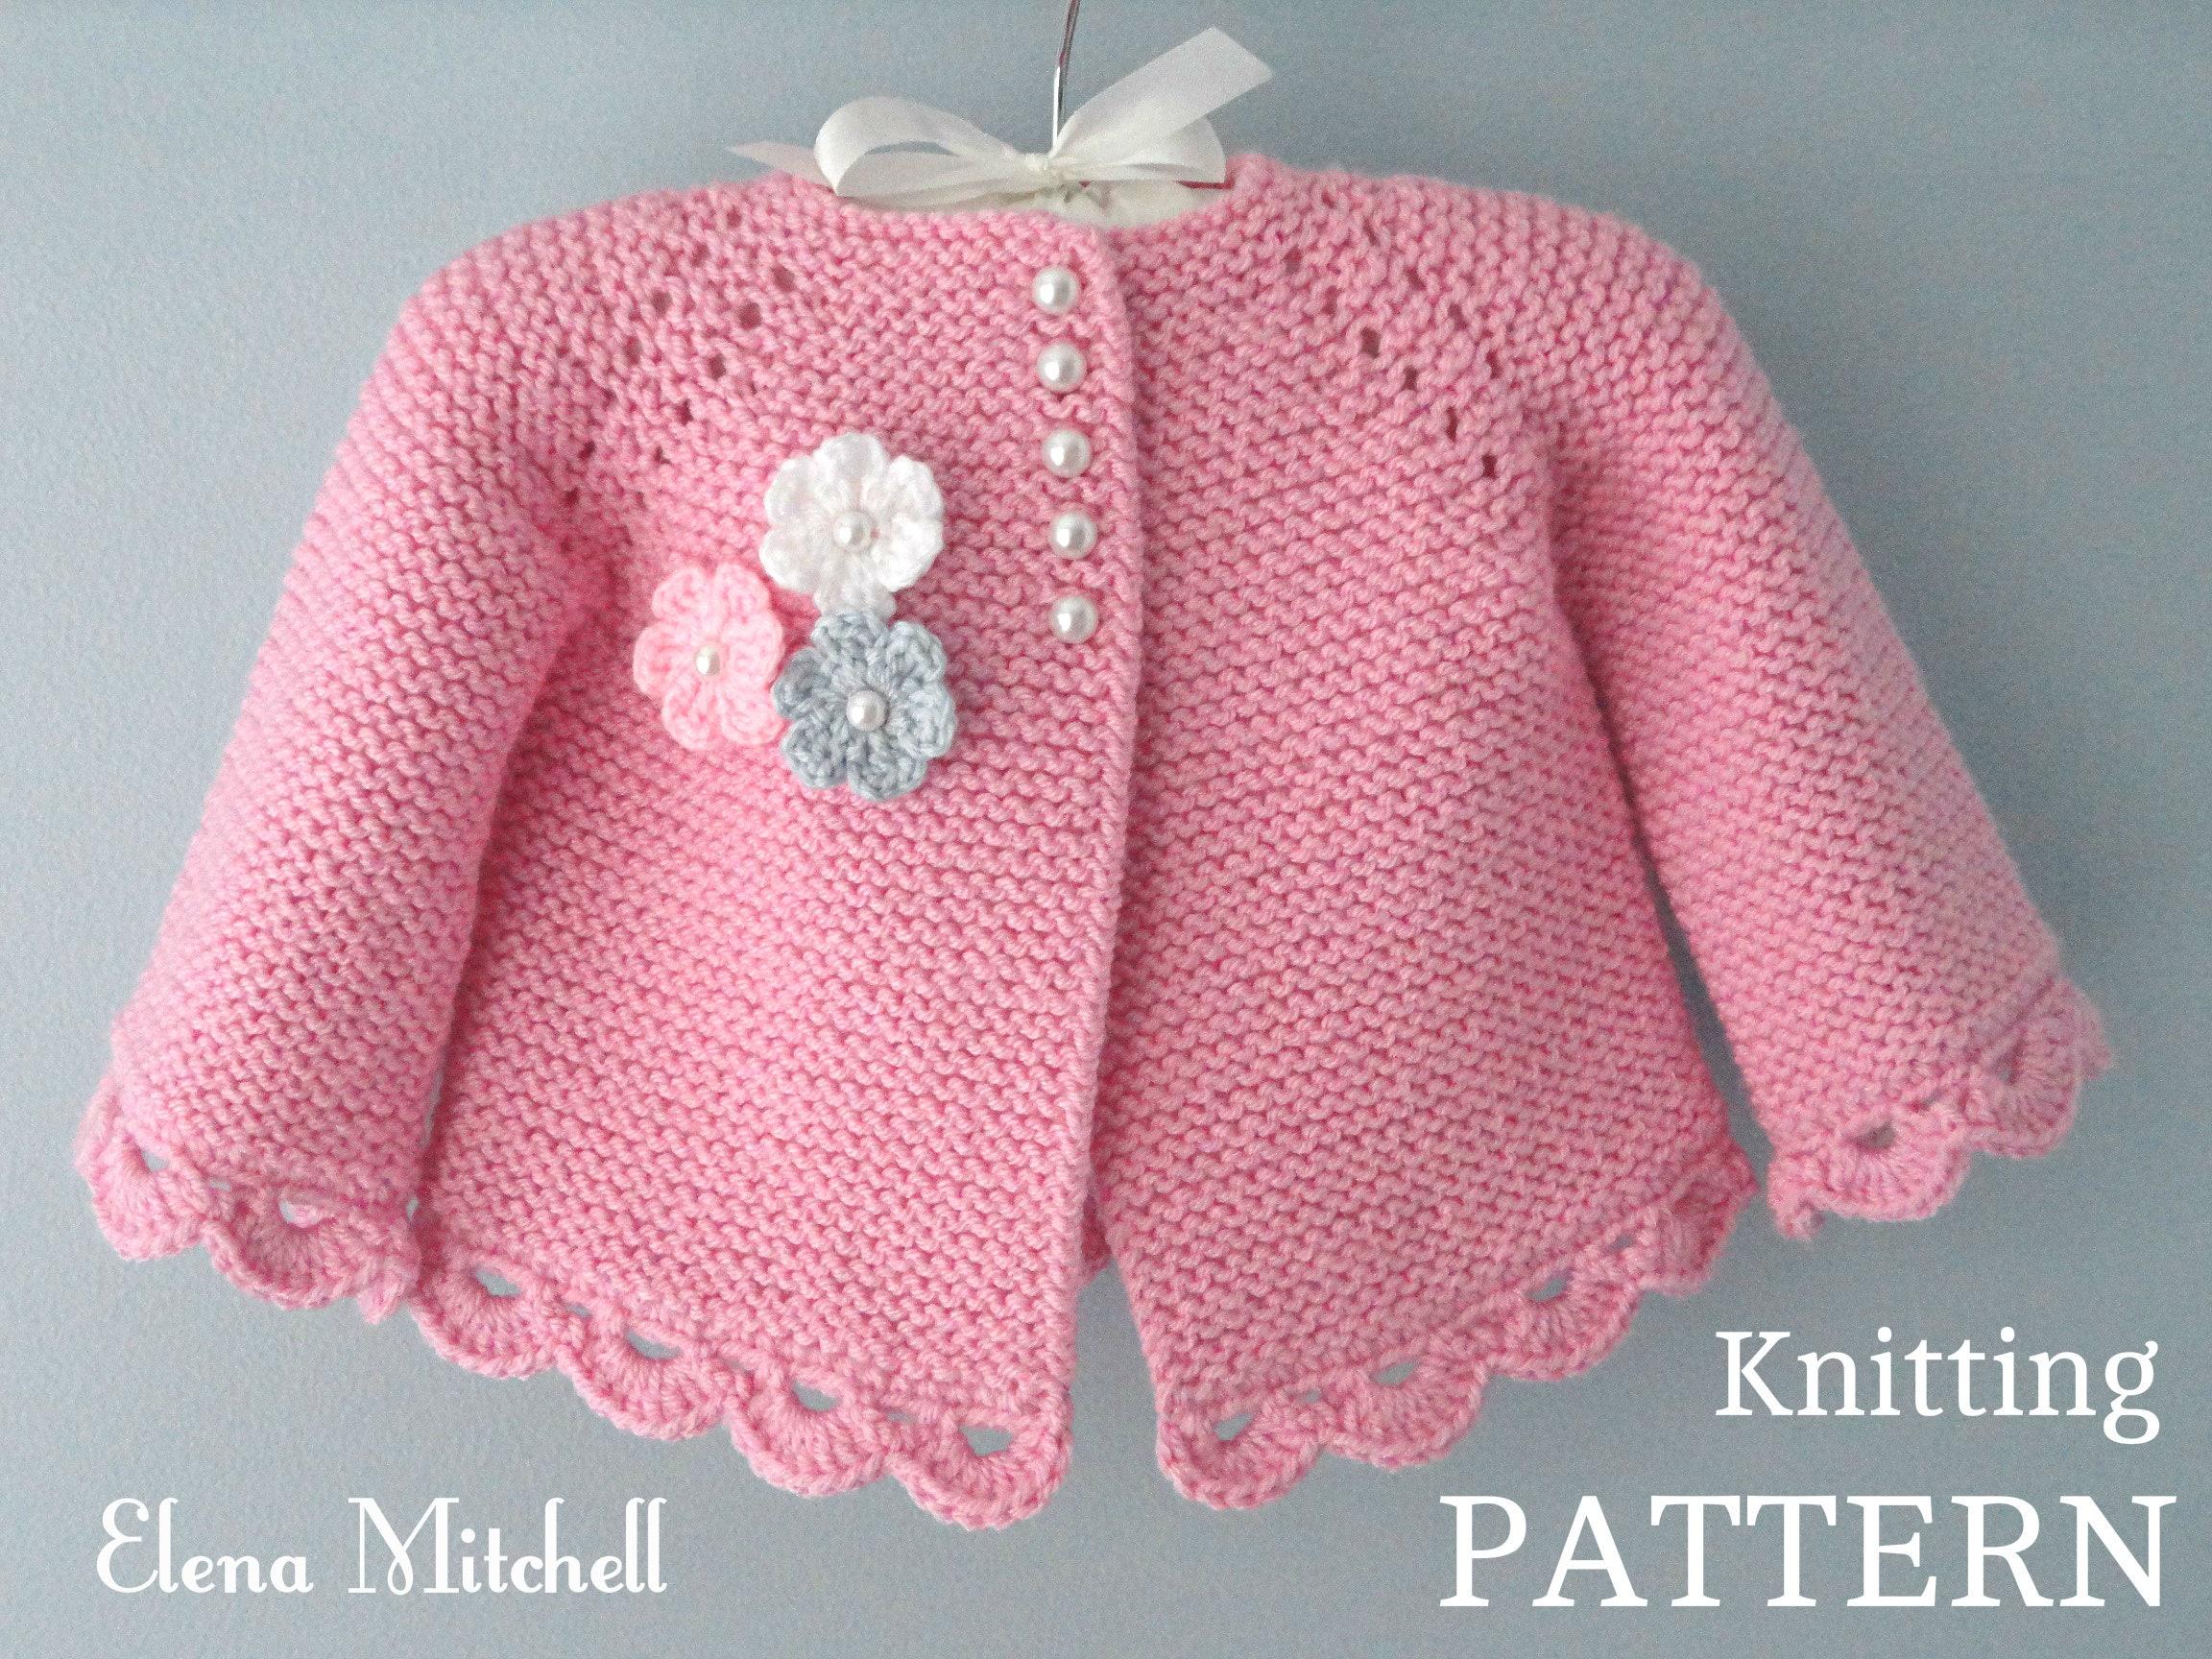 Knitting PATTERN Baby Jacket Baby Cardigan Garter stitch Knit ...